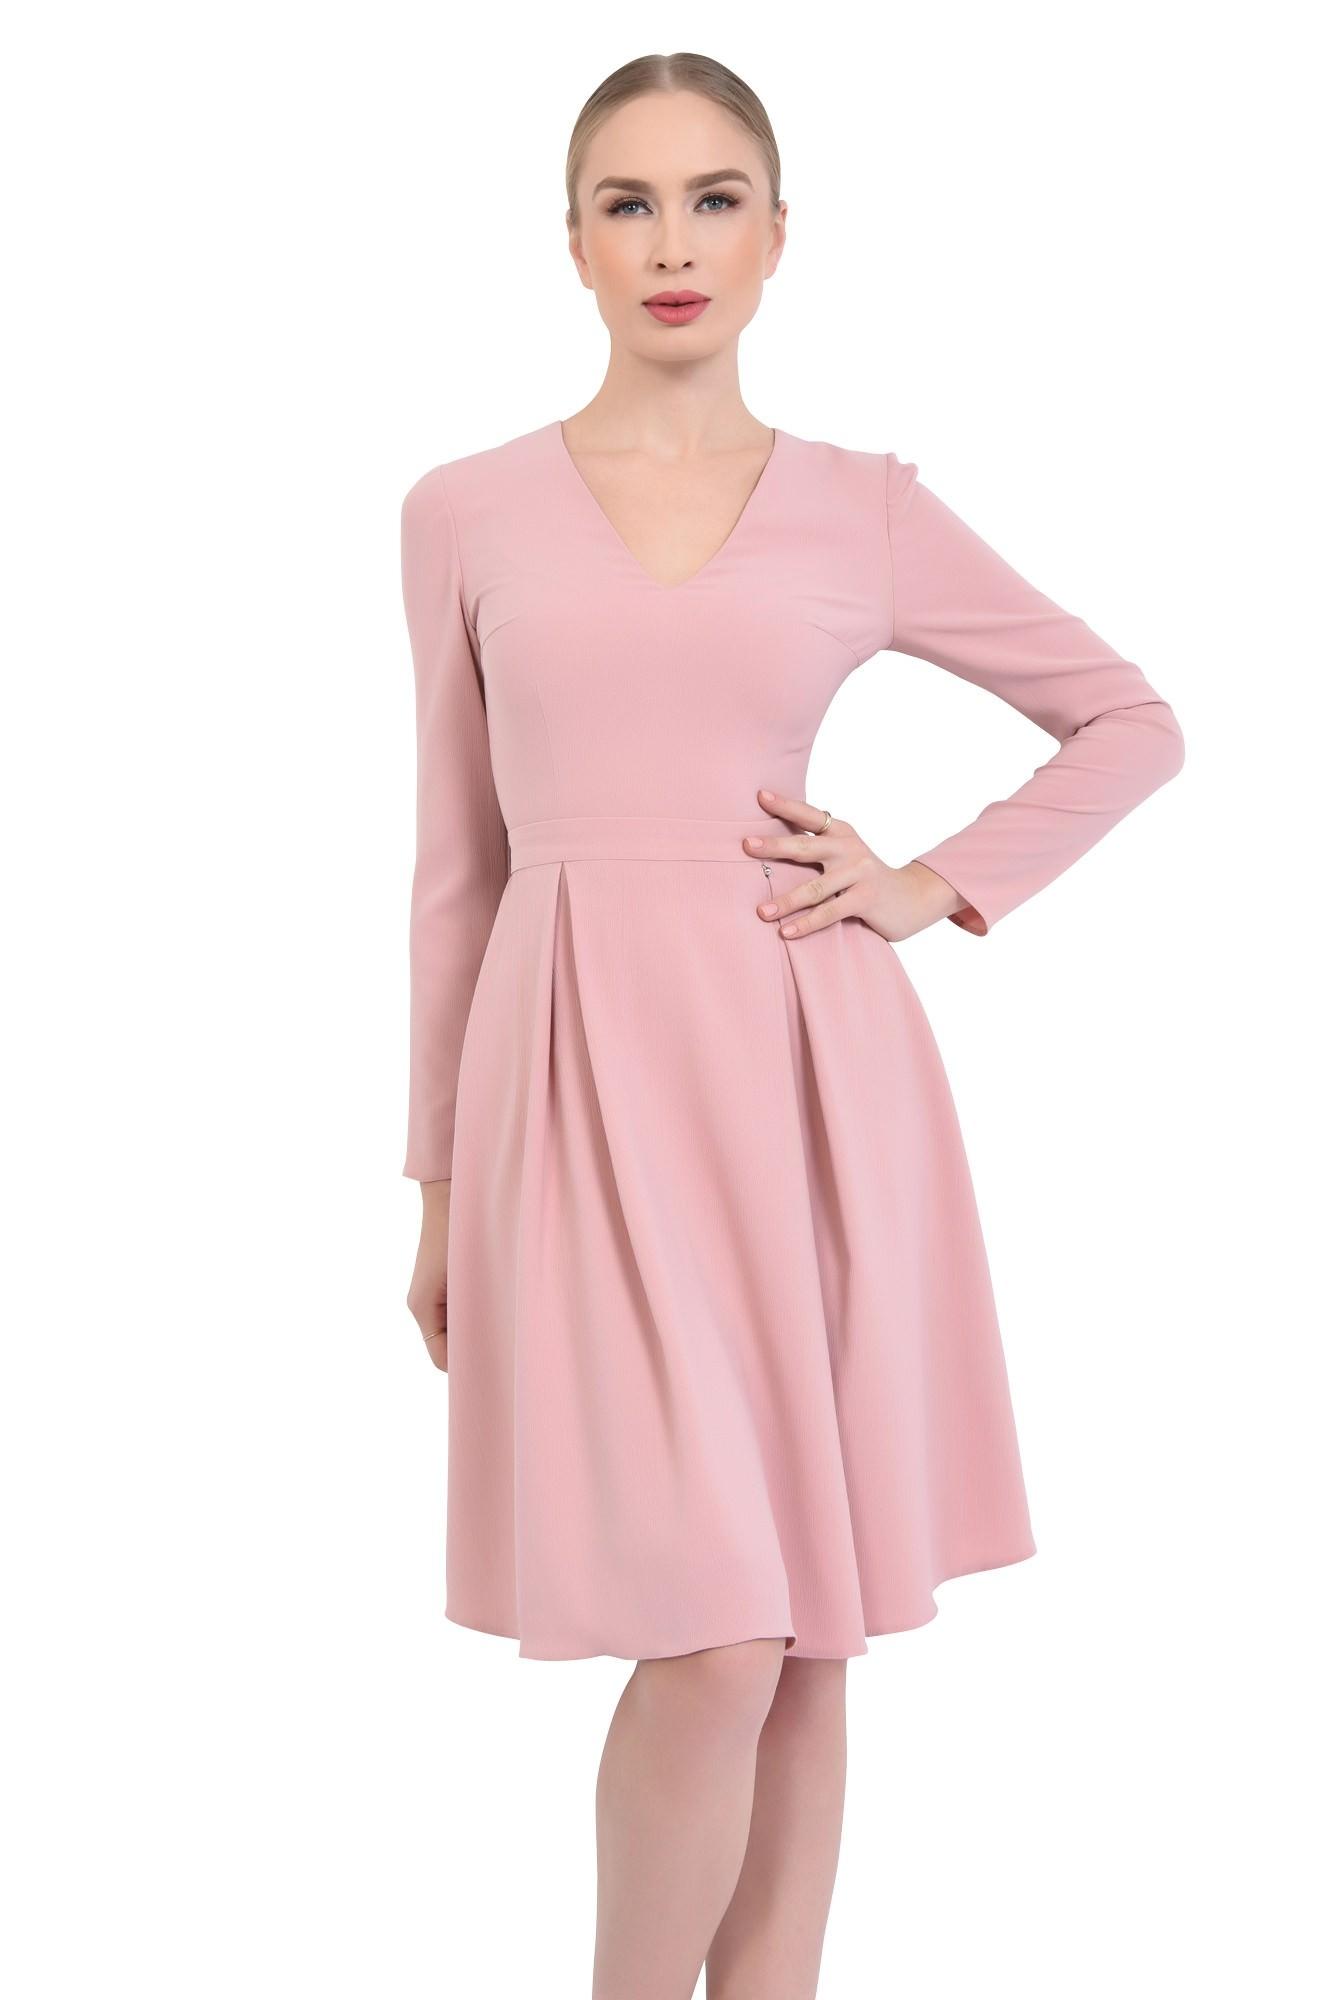 0 - Rochie de zi evazata, roz